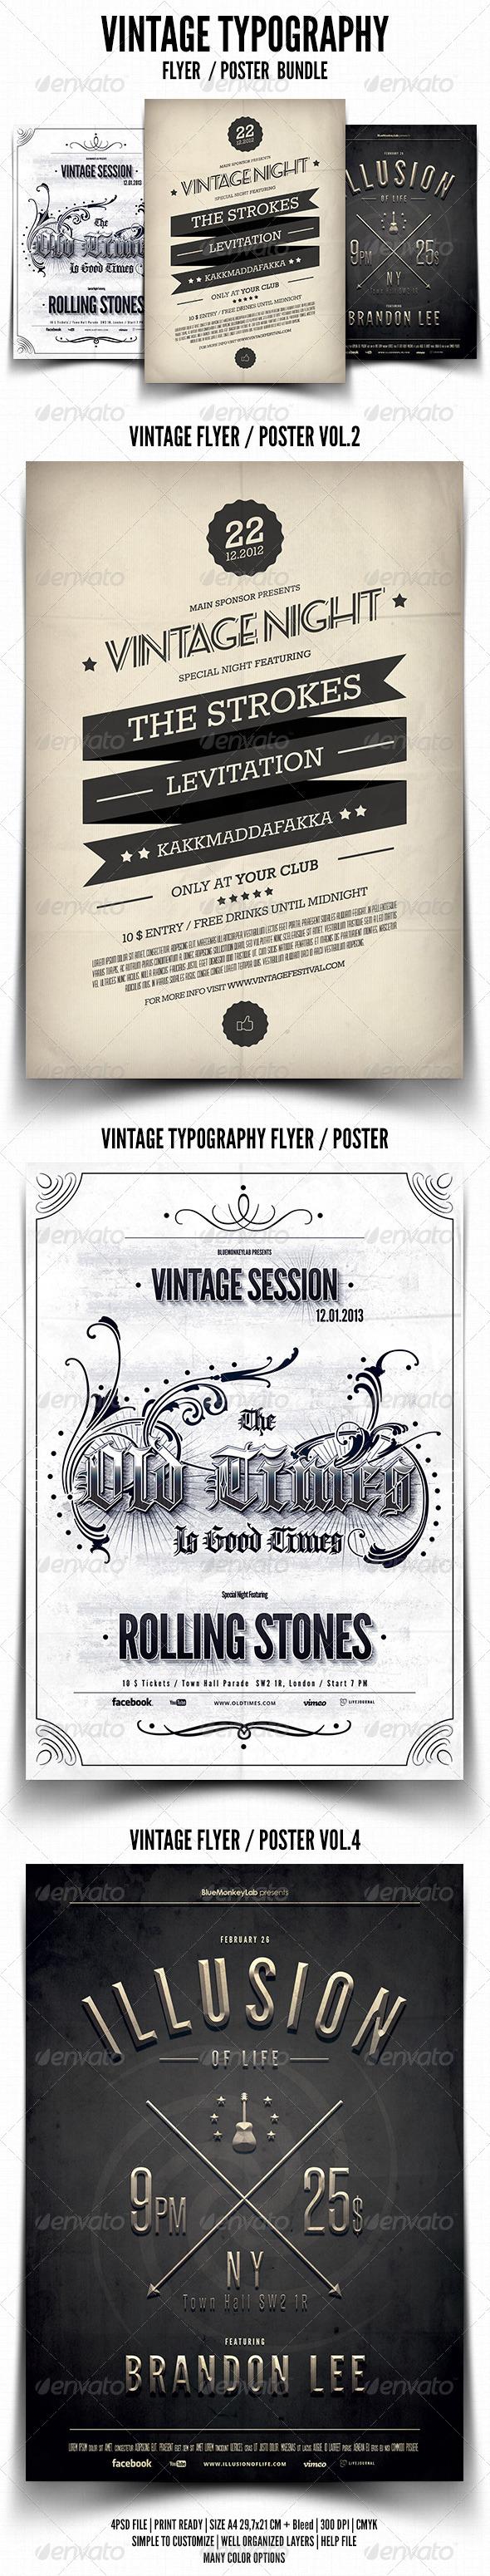 GraphicRiver Vintage Typography Flyer Poster Bundle 4043213